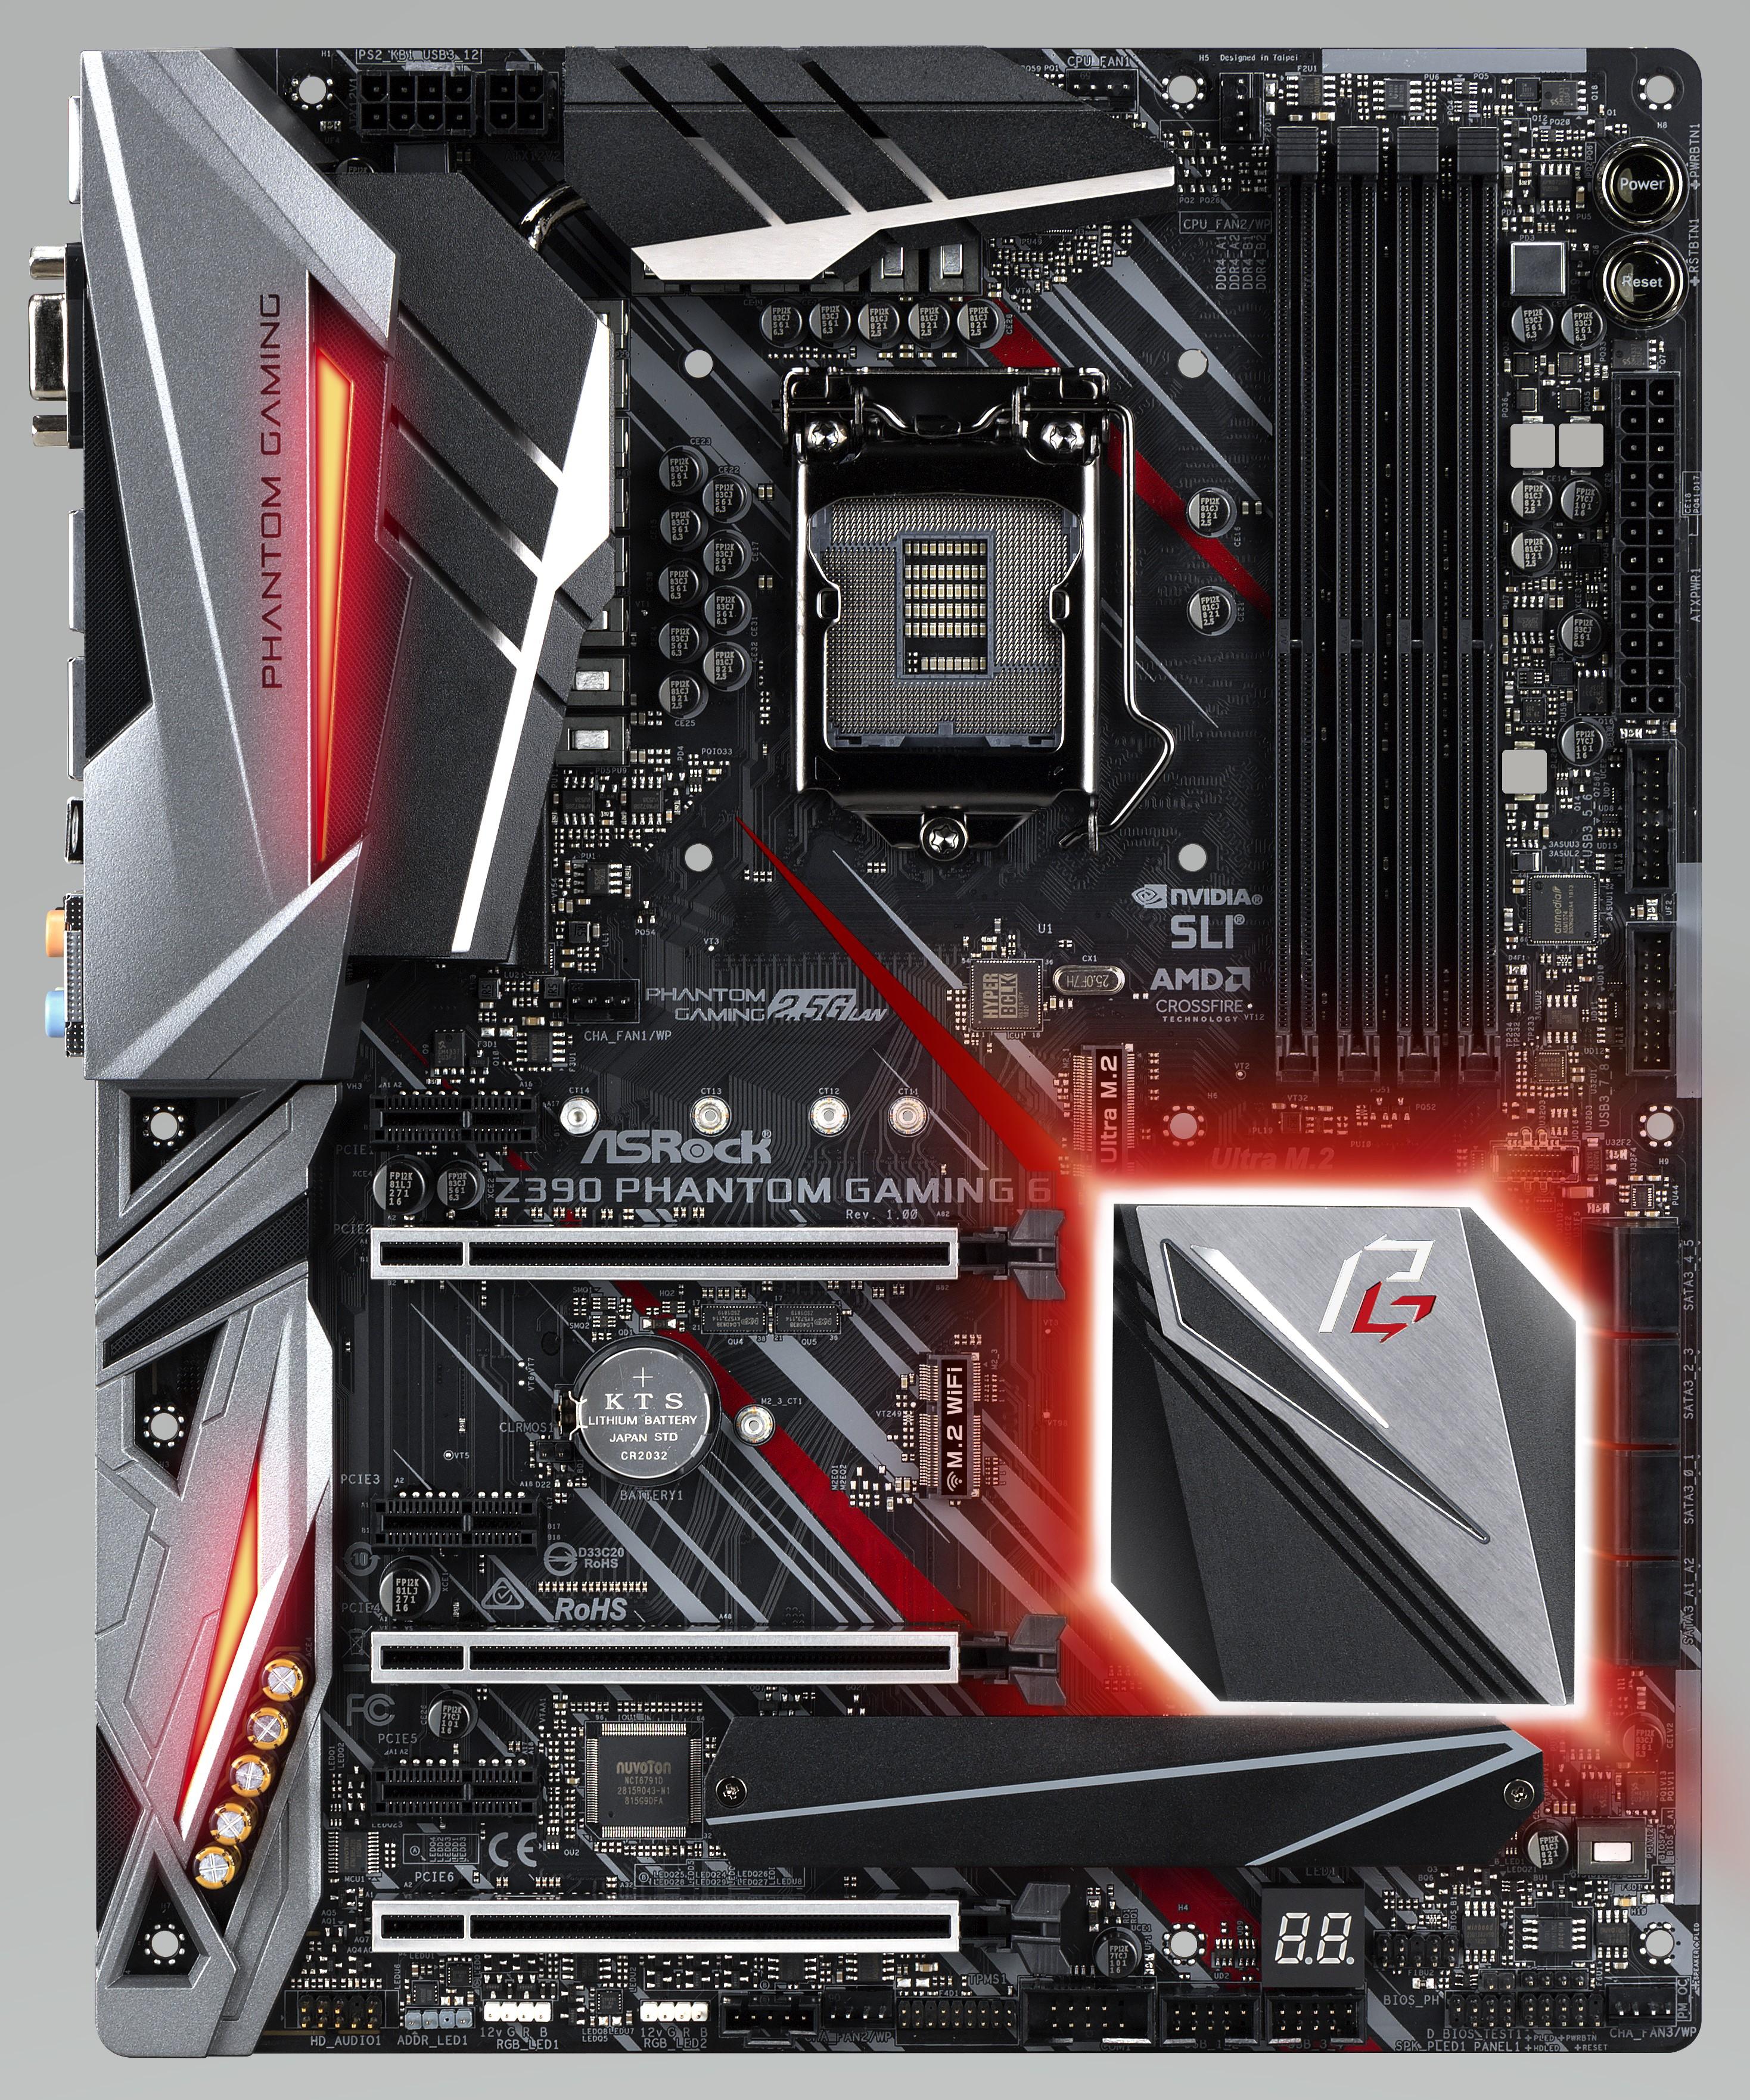 ASRock Z390 Phantom Gaming 6 - Intel Z390 Motherboard